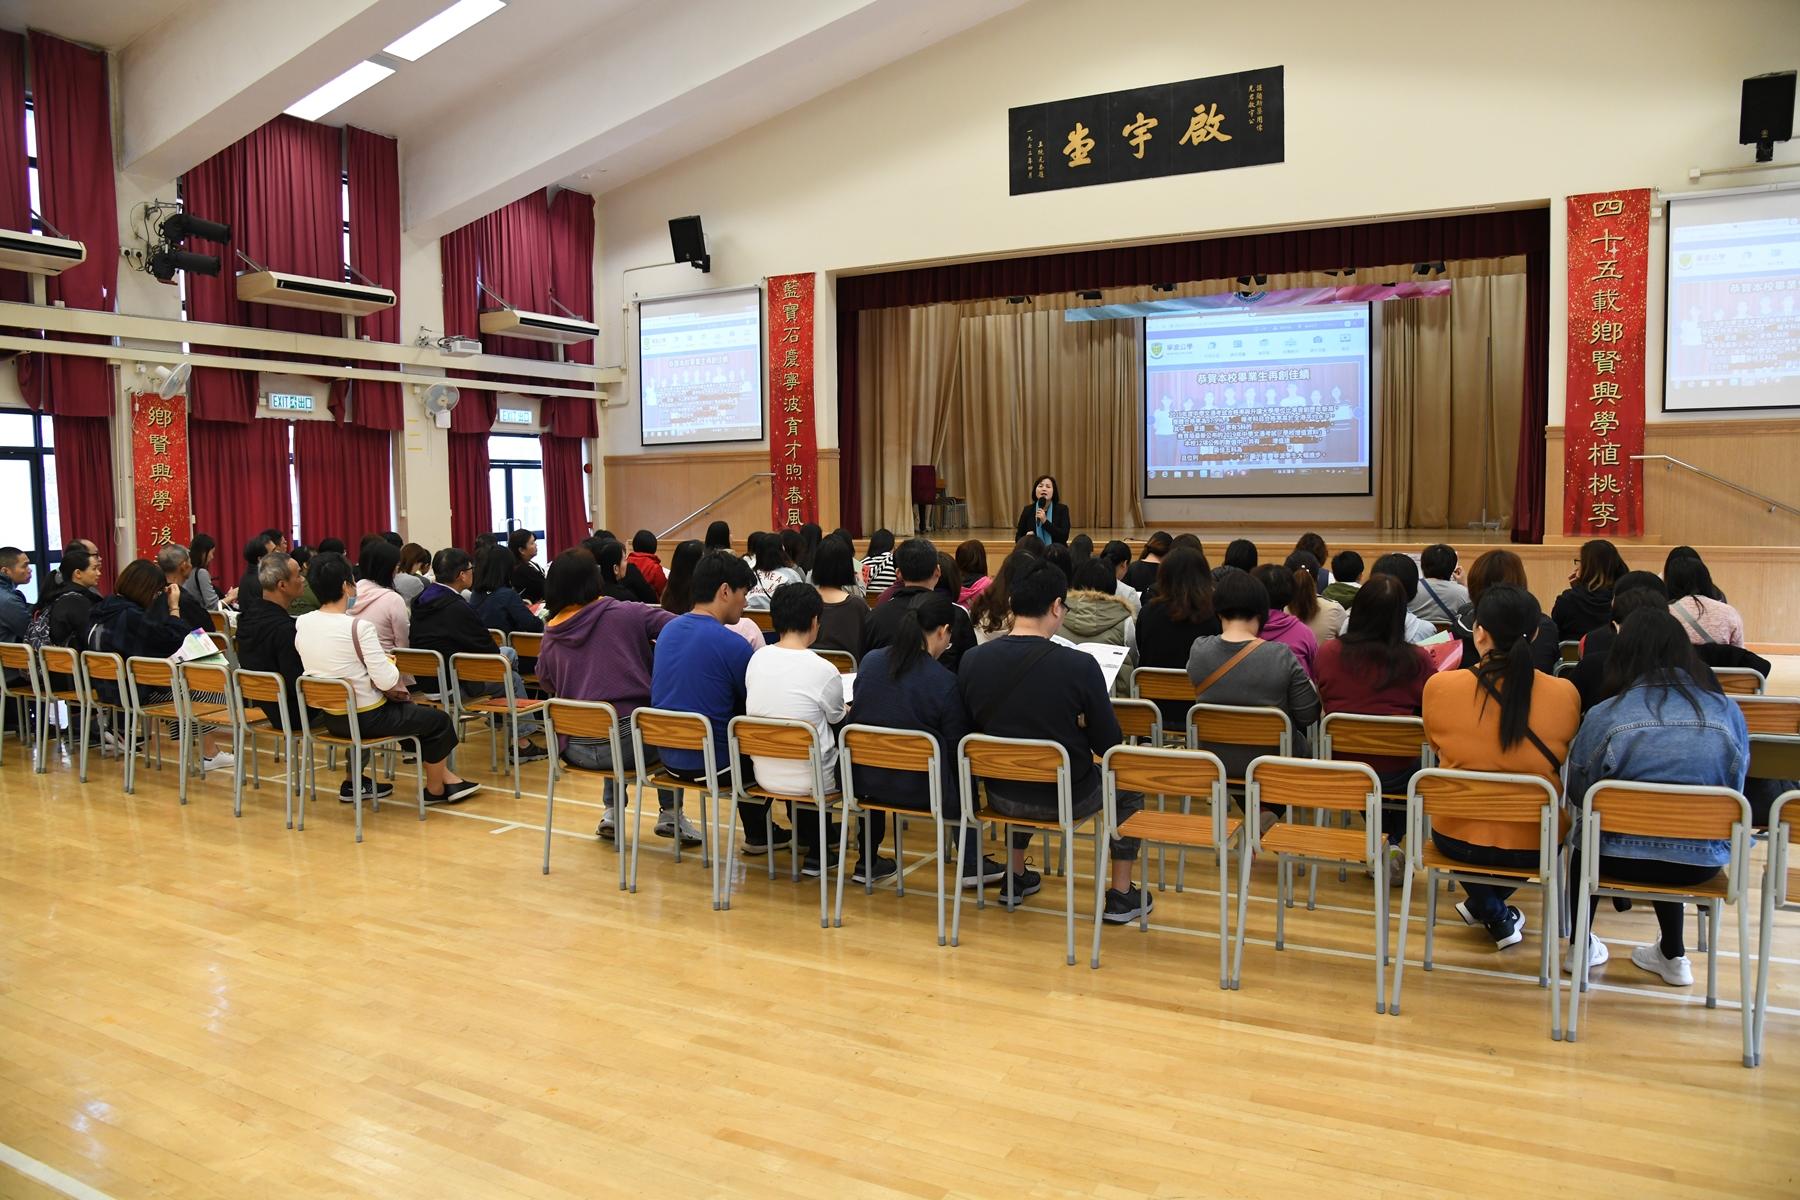 http://npc.edu.hk/sites/default/files/dsc_0147_4.jpg